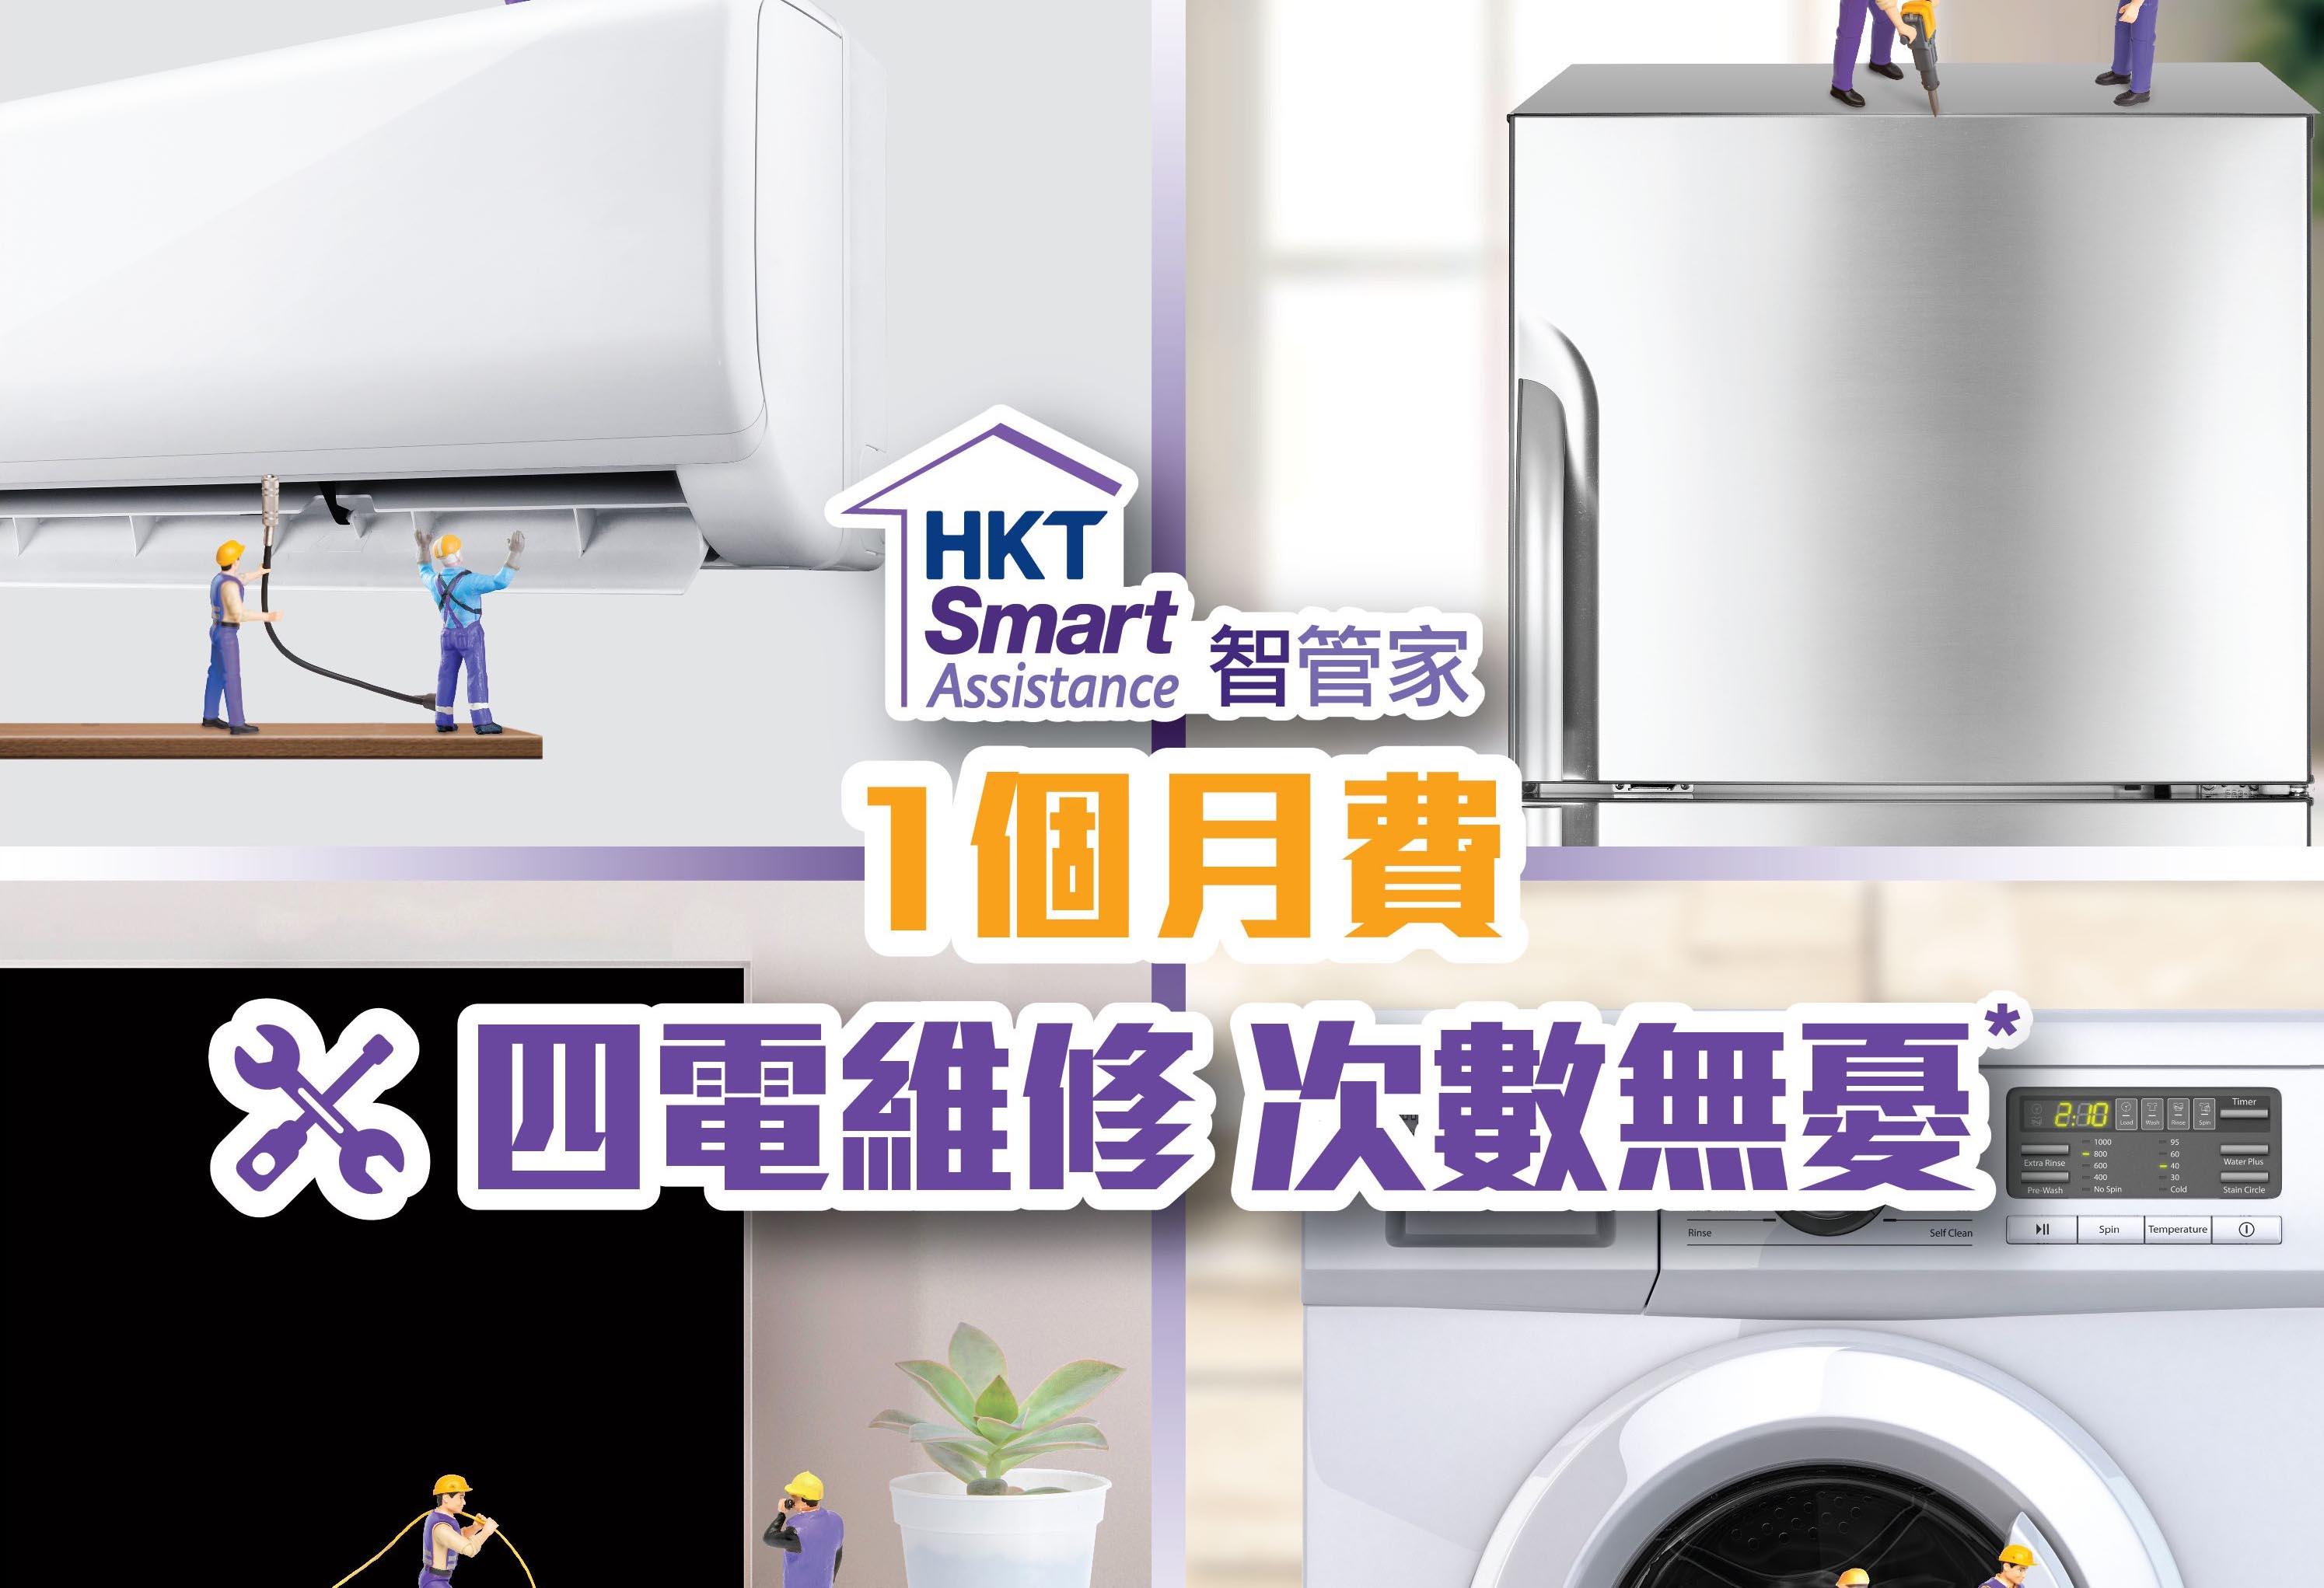 HKT Smart Assistance 智管家  一站式家居電器上門維修服務